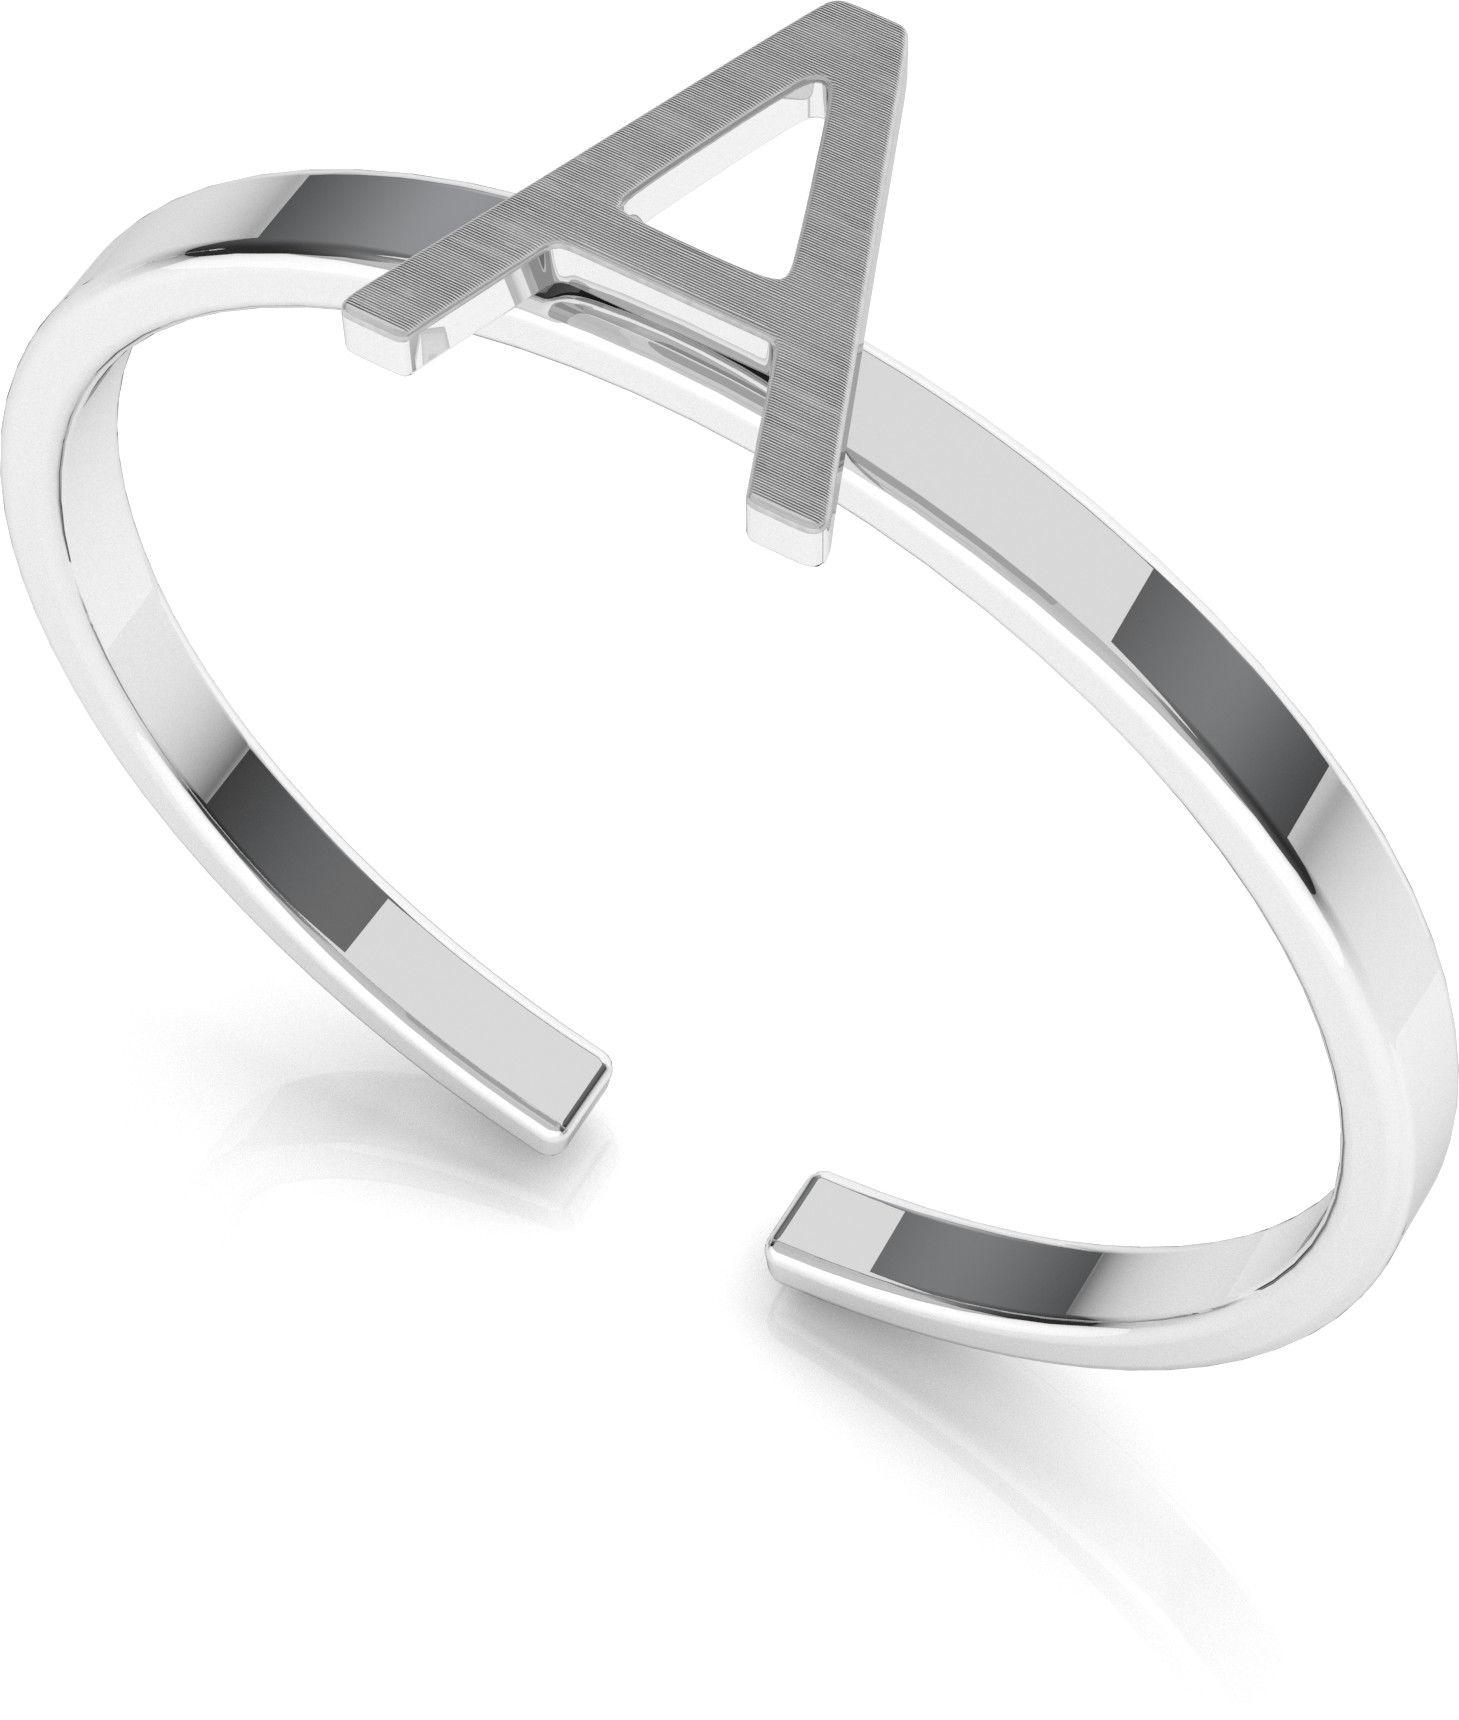 Srebrny pierścionek z literką My RING, srebro 925 : Litera - A, Srebro - kolor pokrycia - Pokrycie platyną